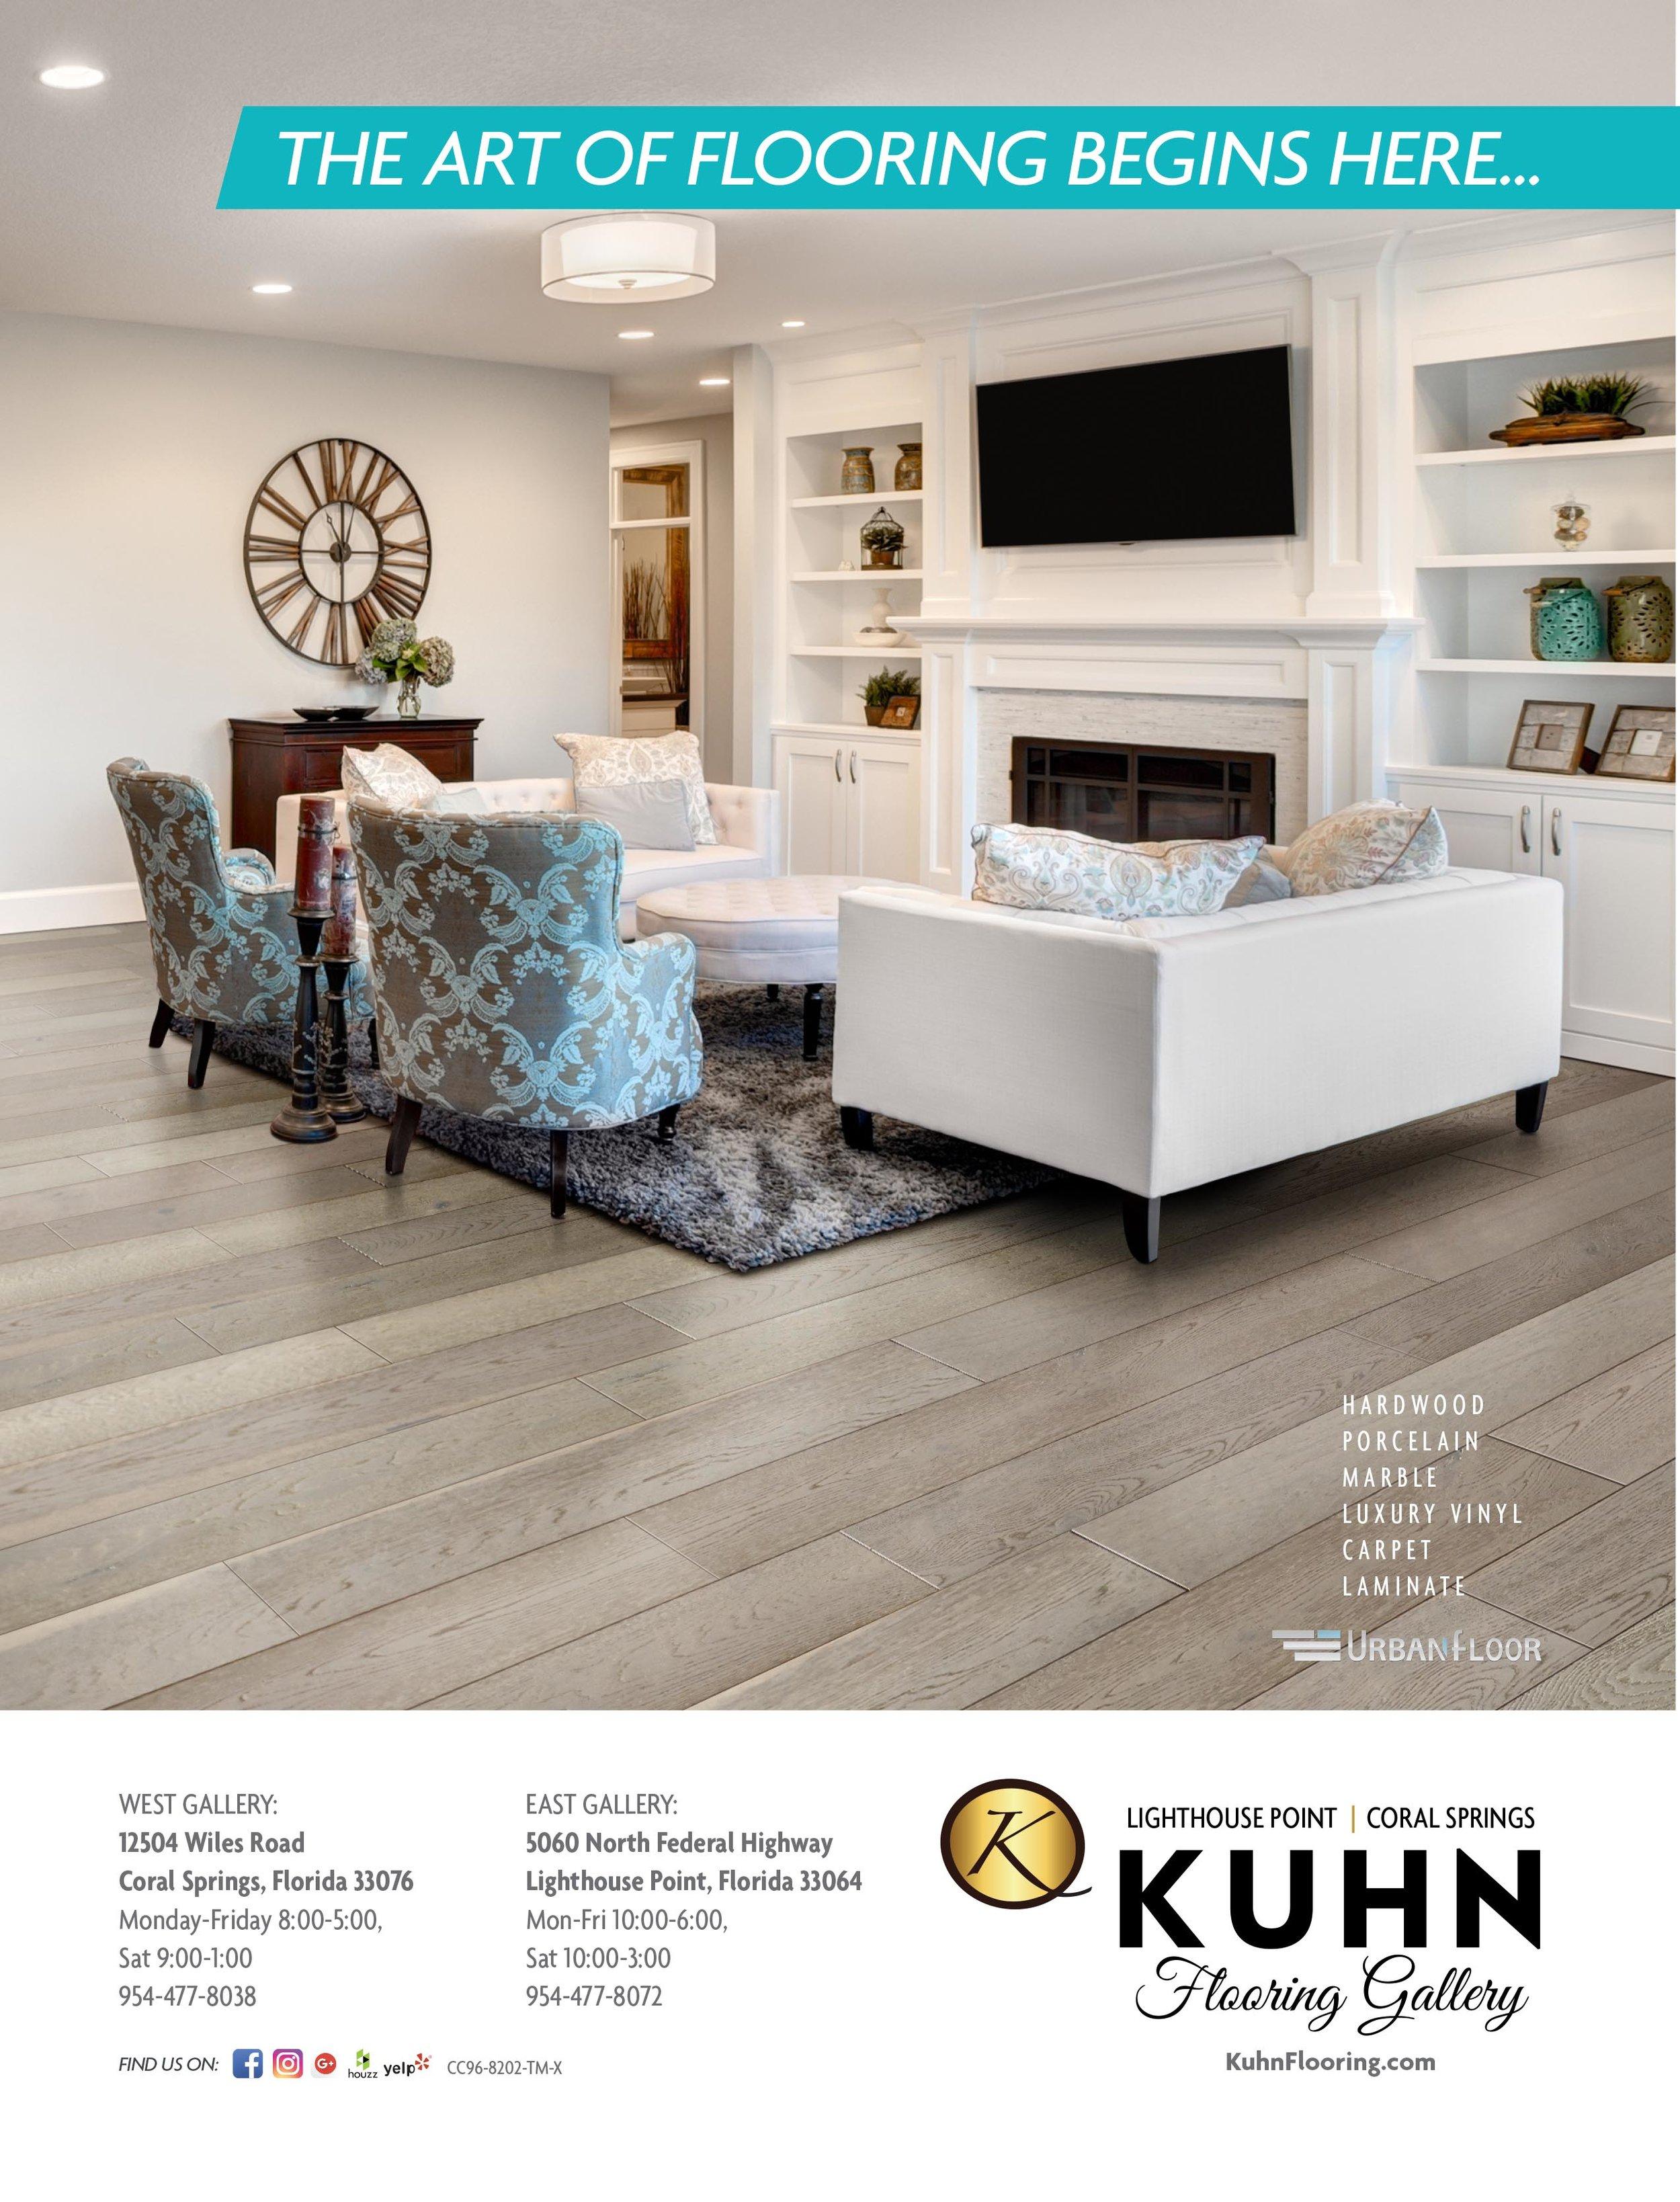 Client: Kuhn Flooring